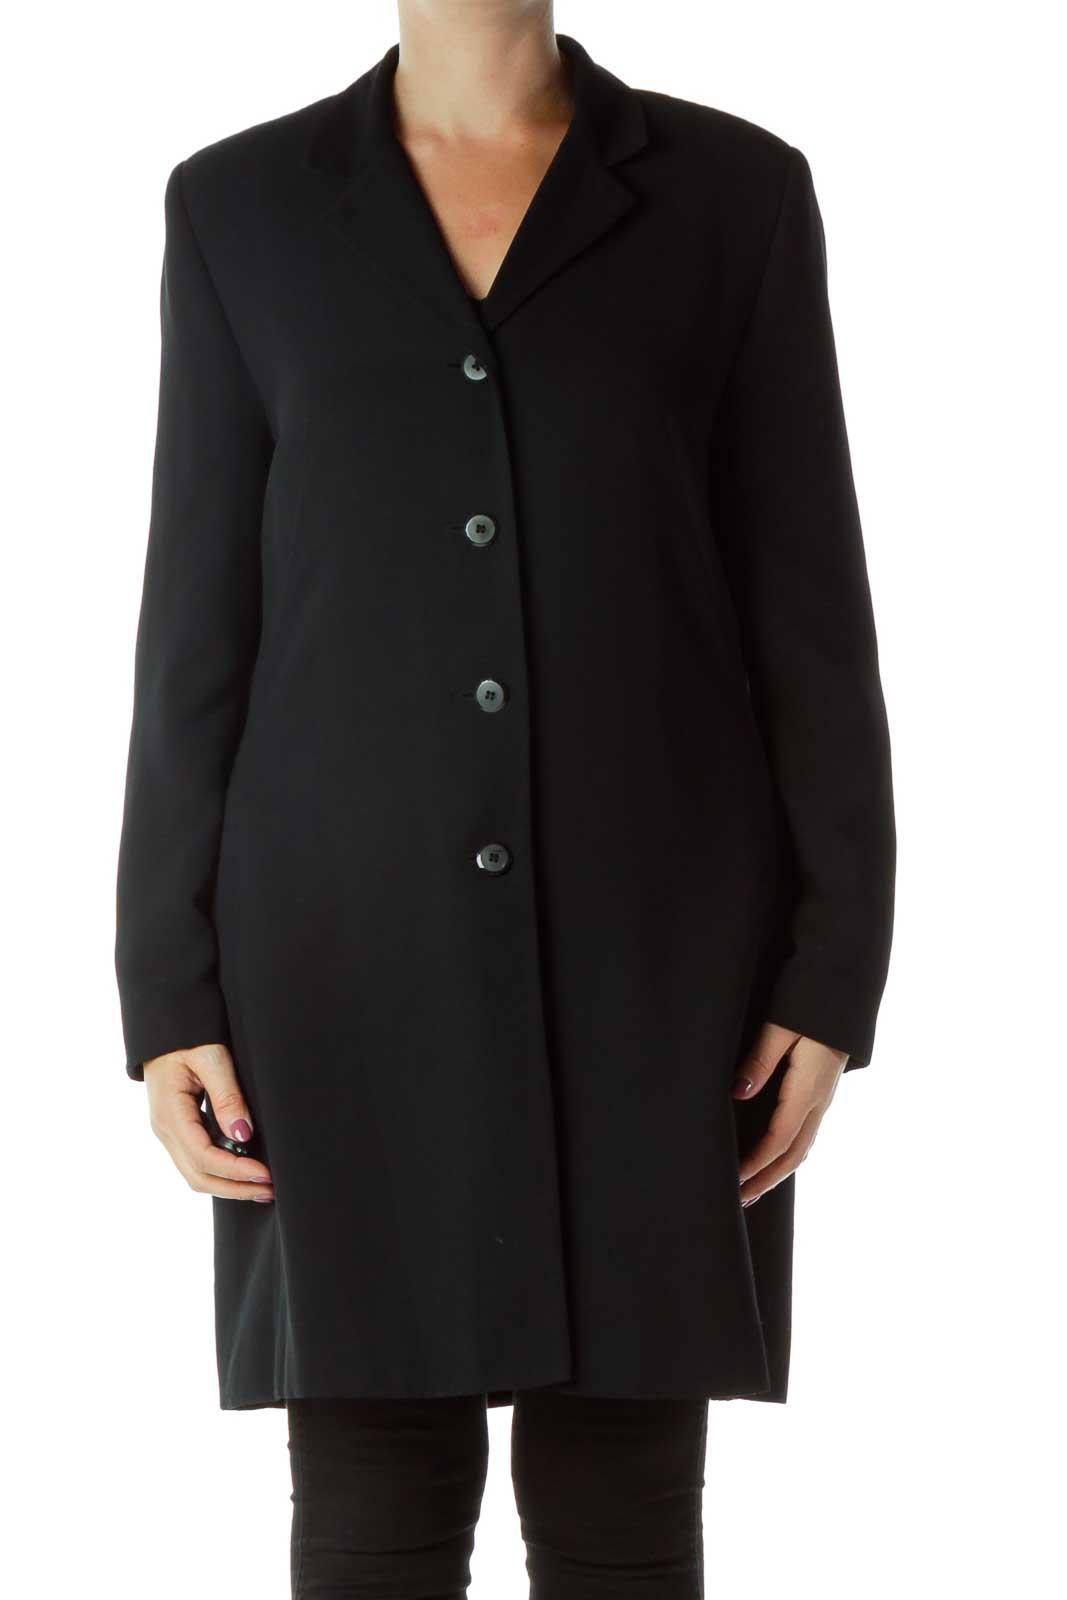 Black Collared Coat Front